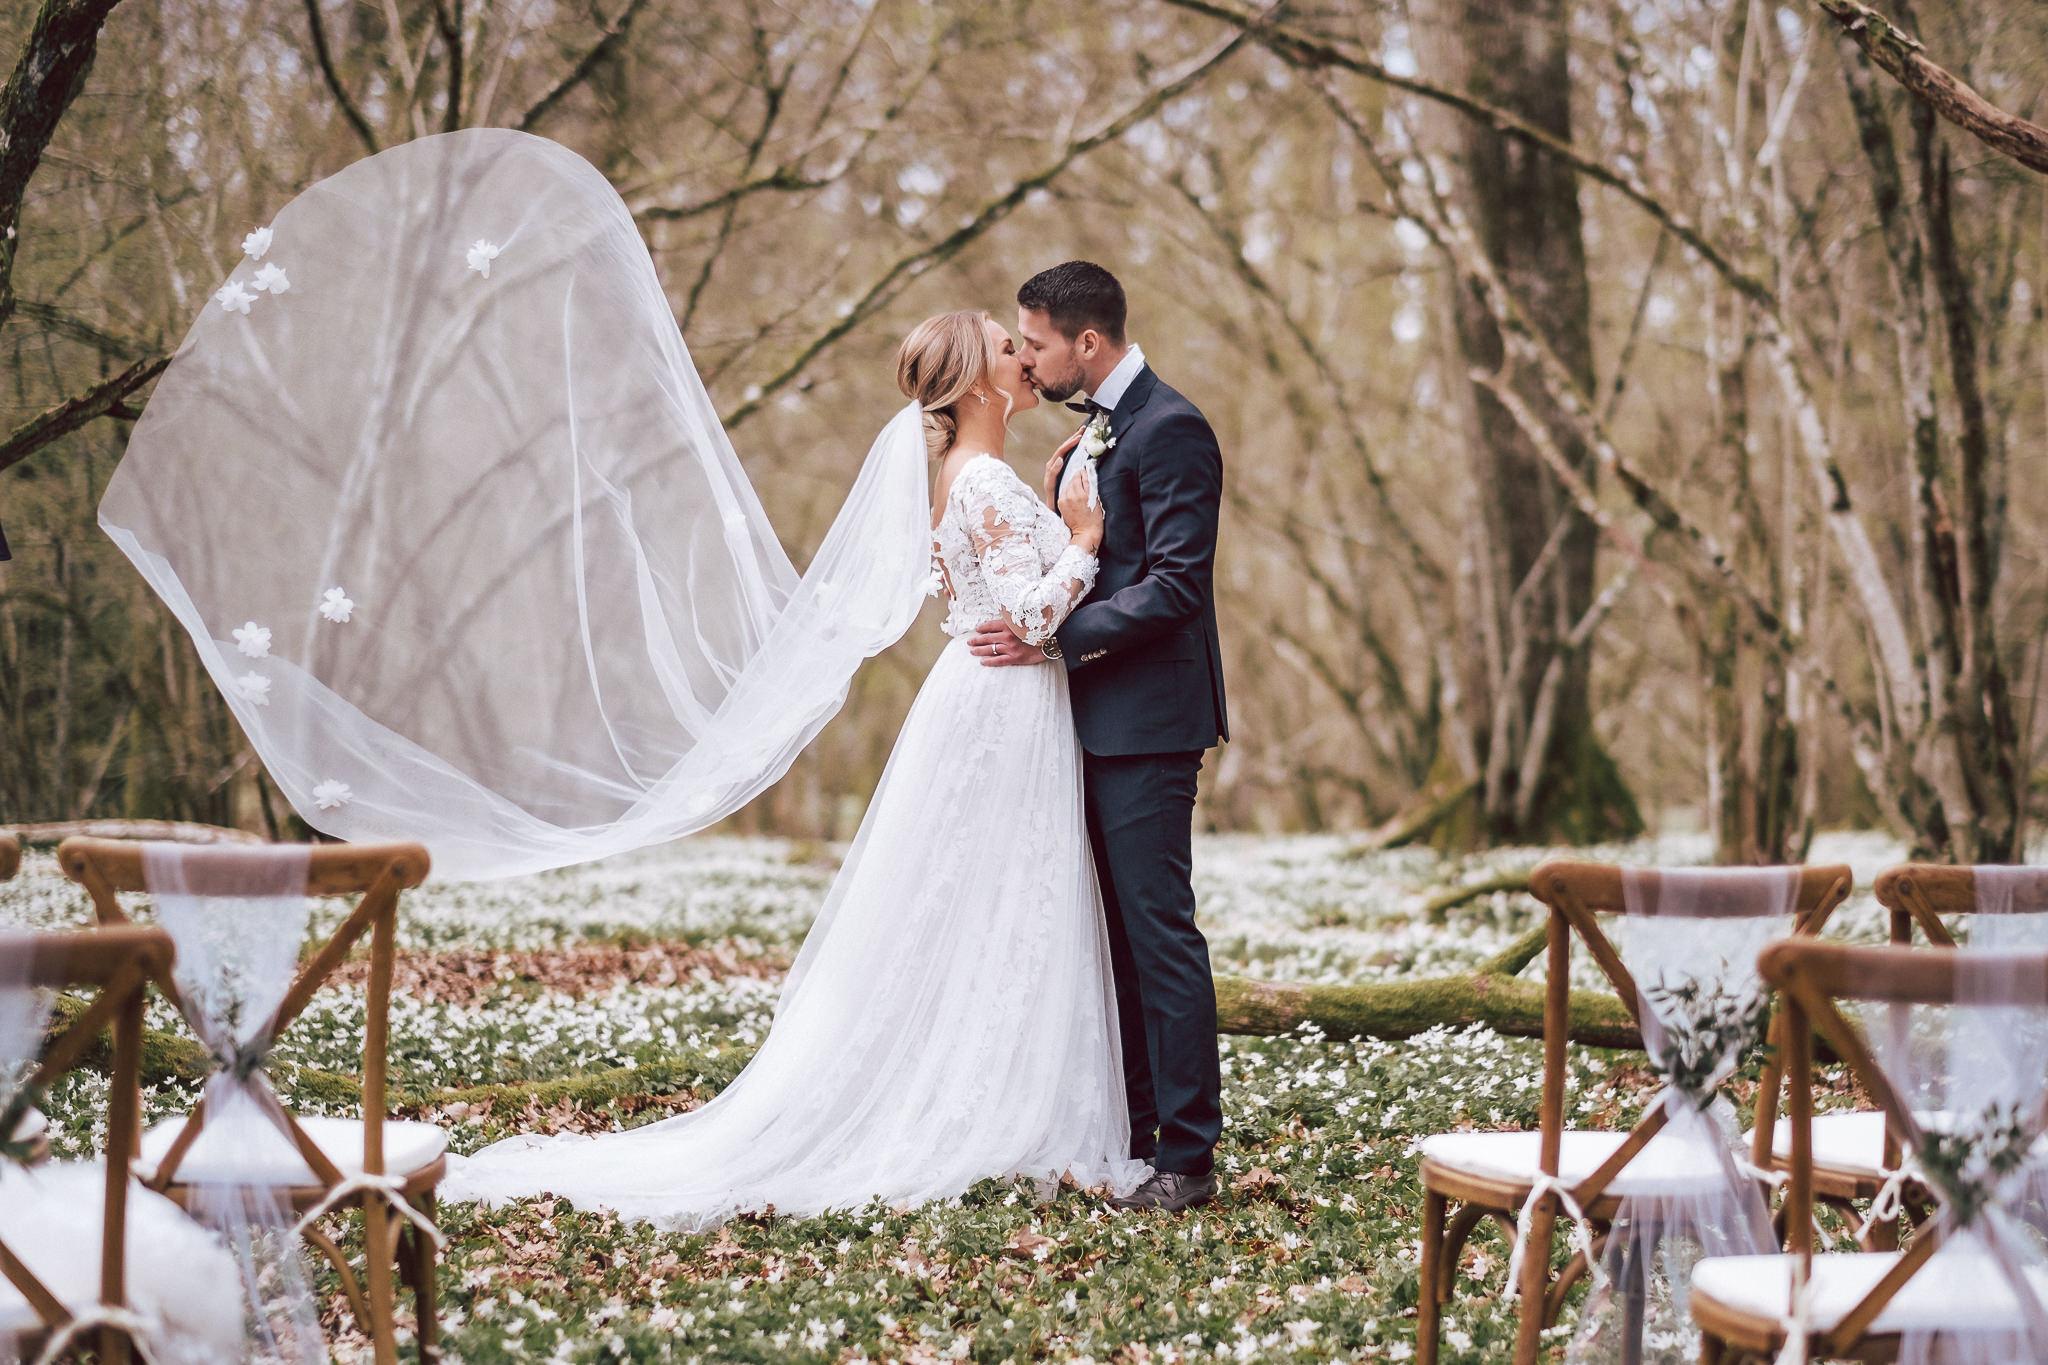 Stylat vårbröllop i Prästalund